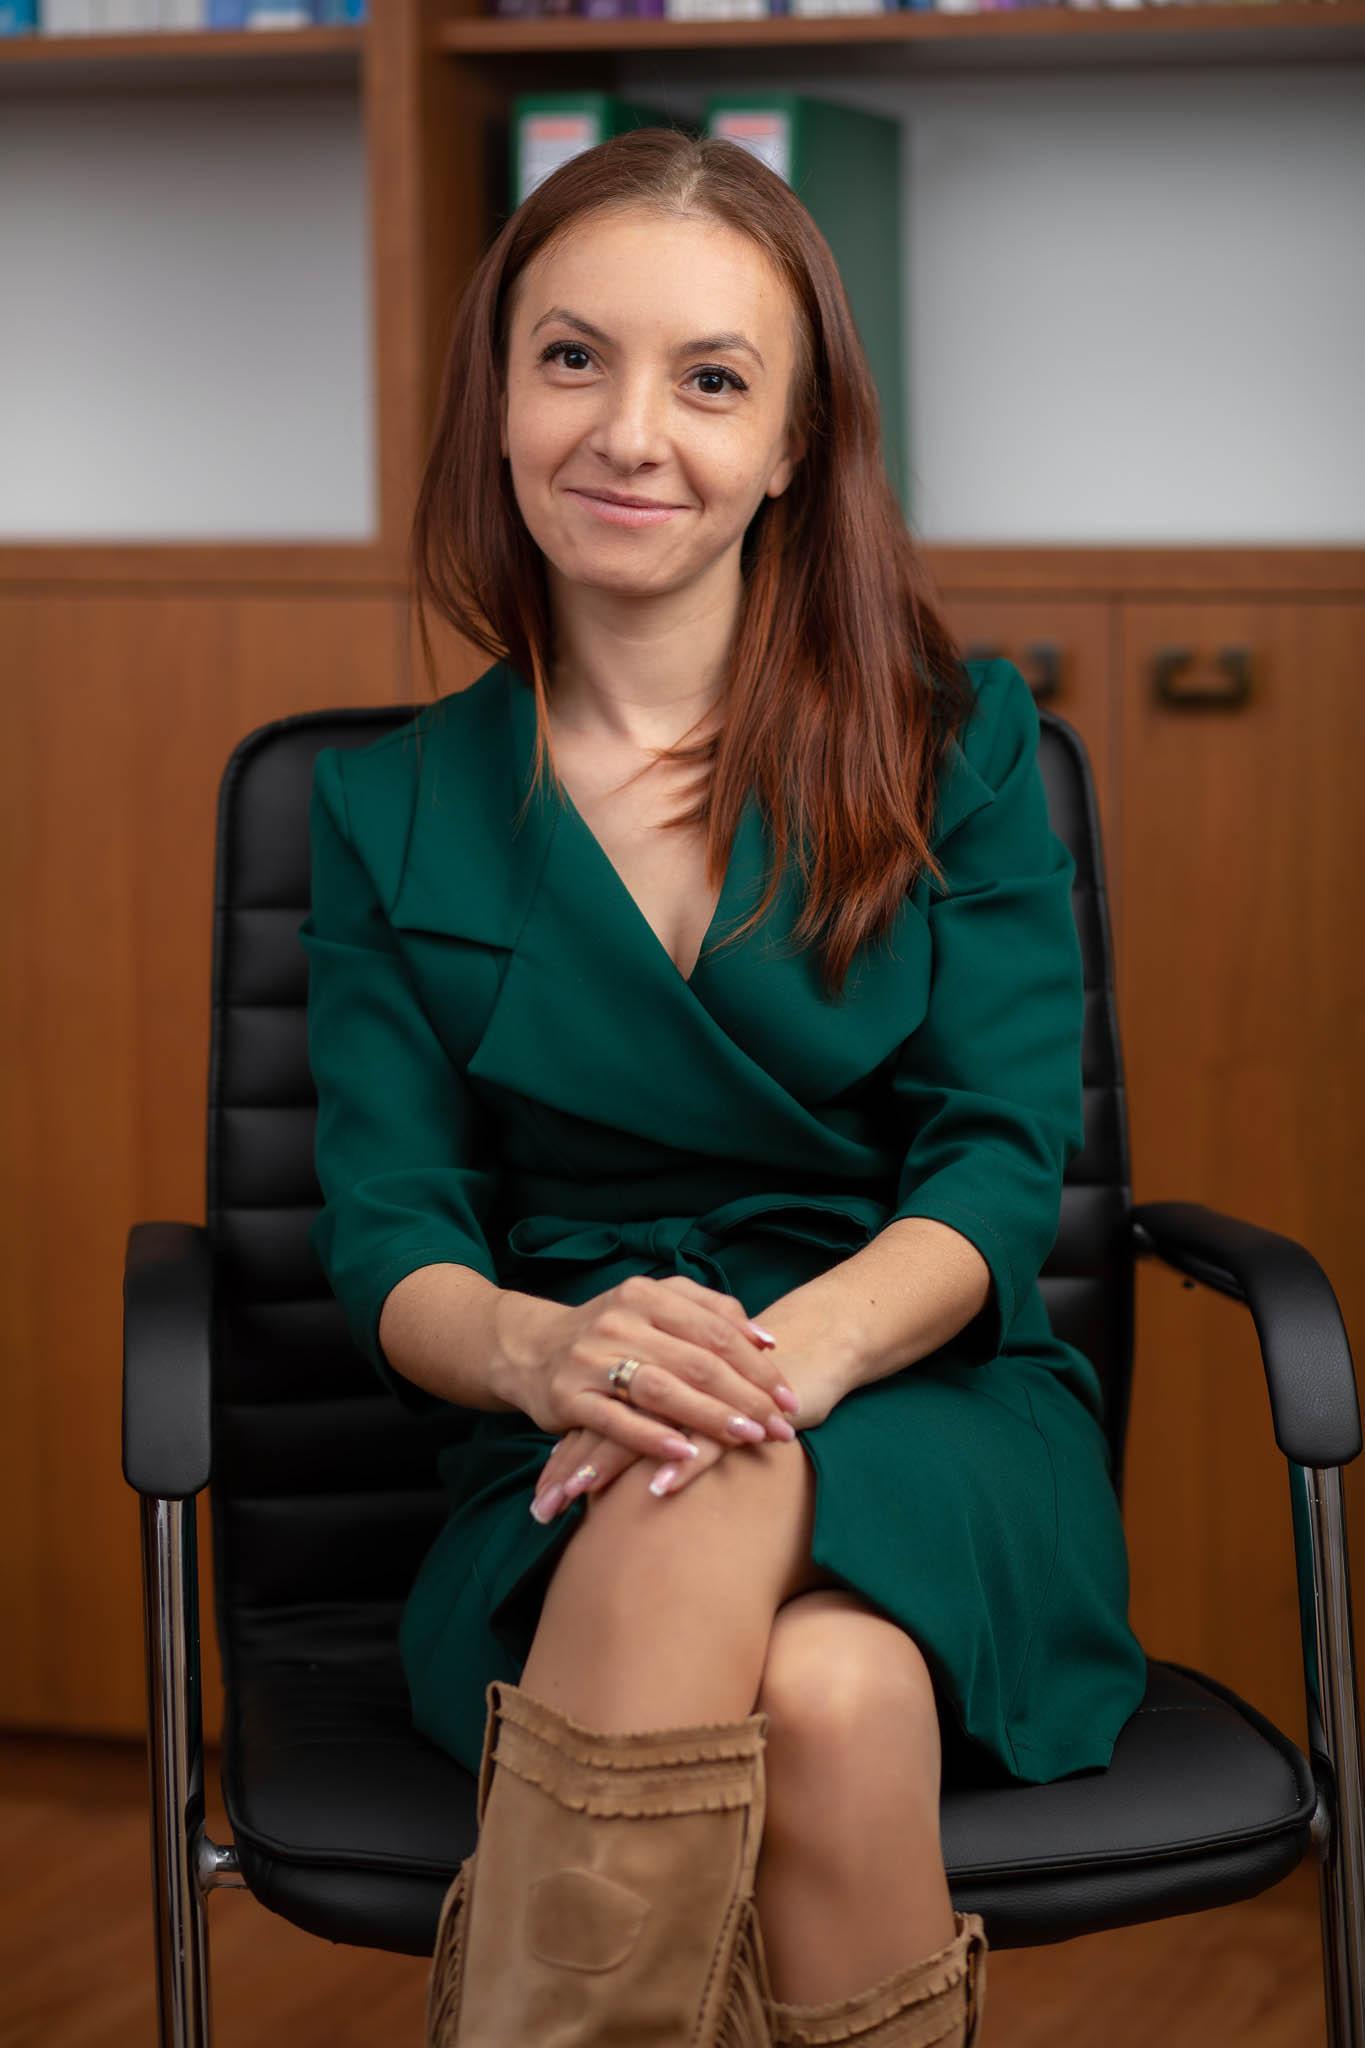 Mihaela Ignia